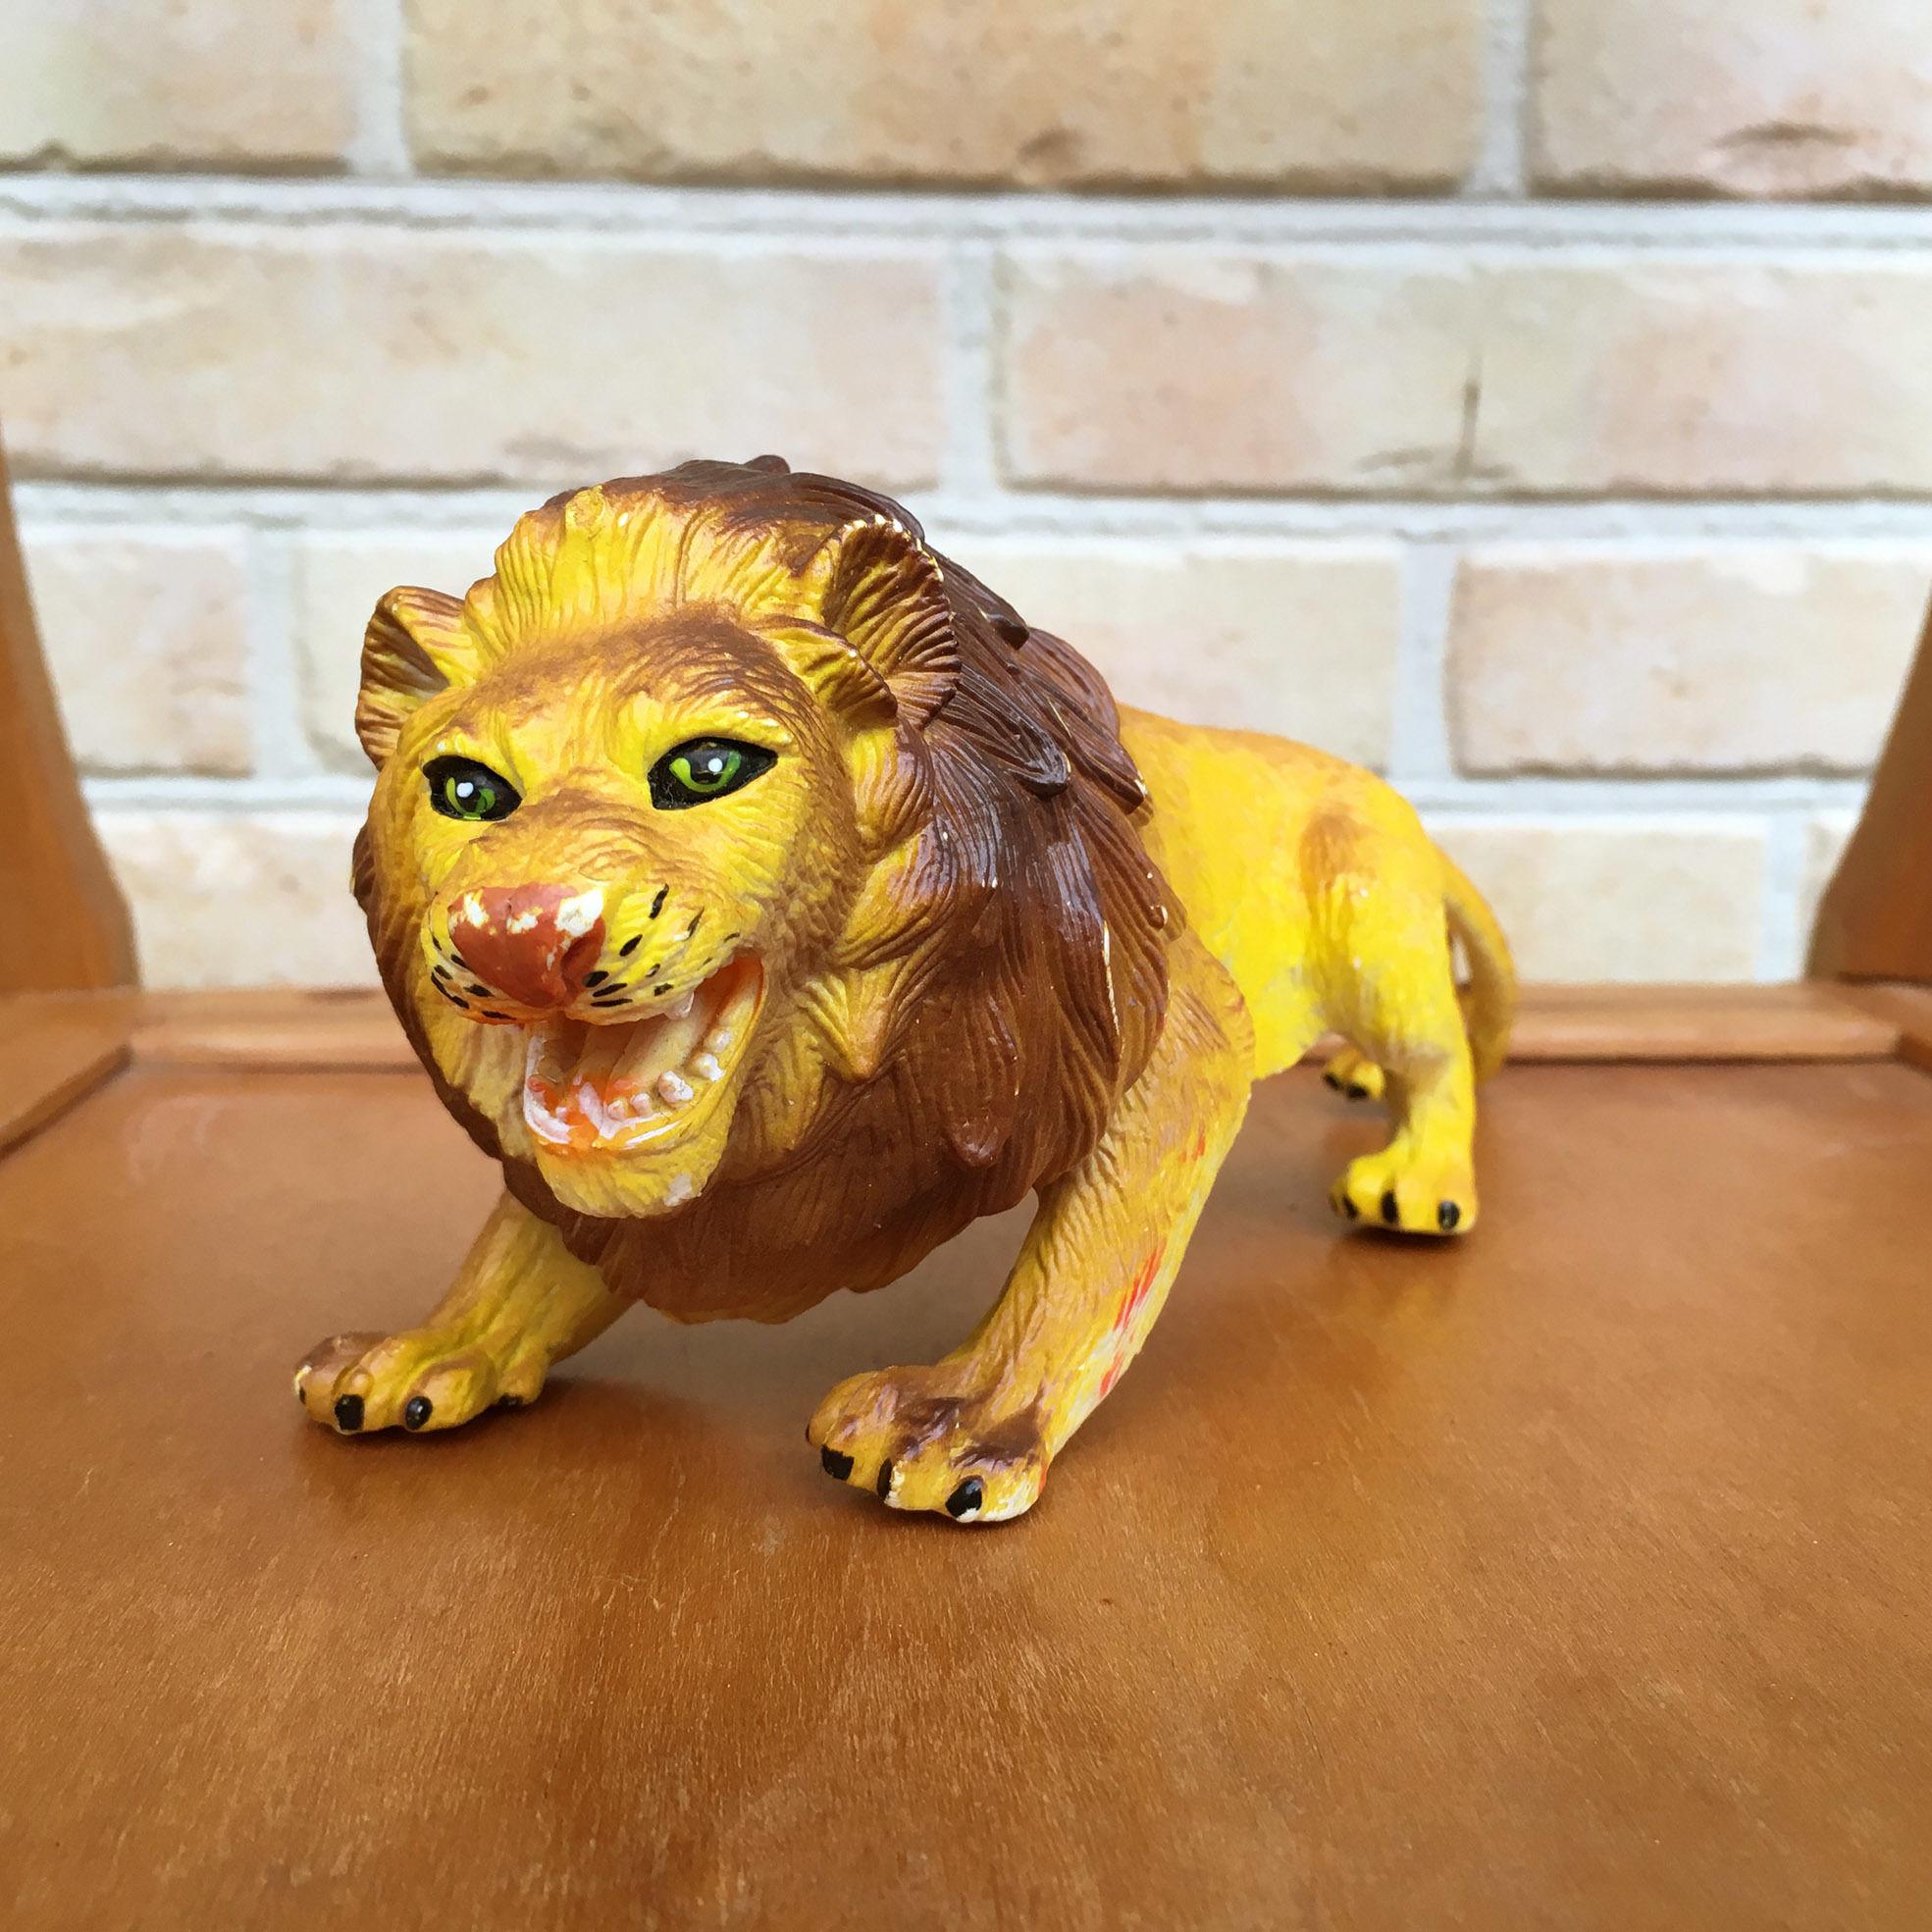 Rubber Toy Lion/ラバートイ ライオン/171111-8